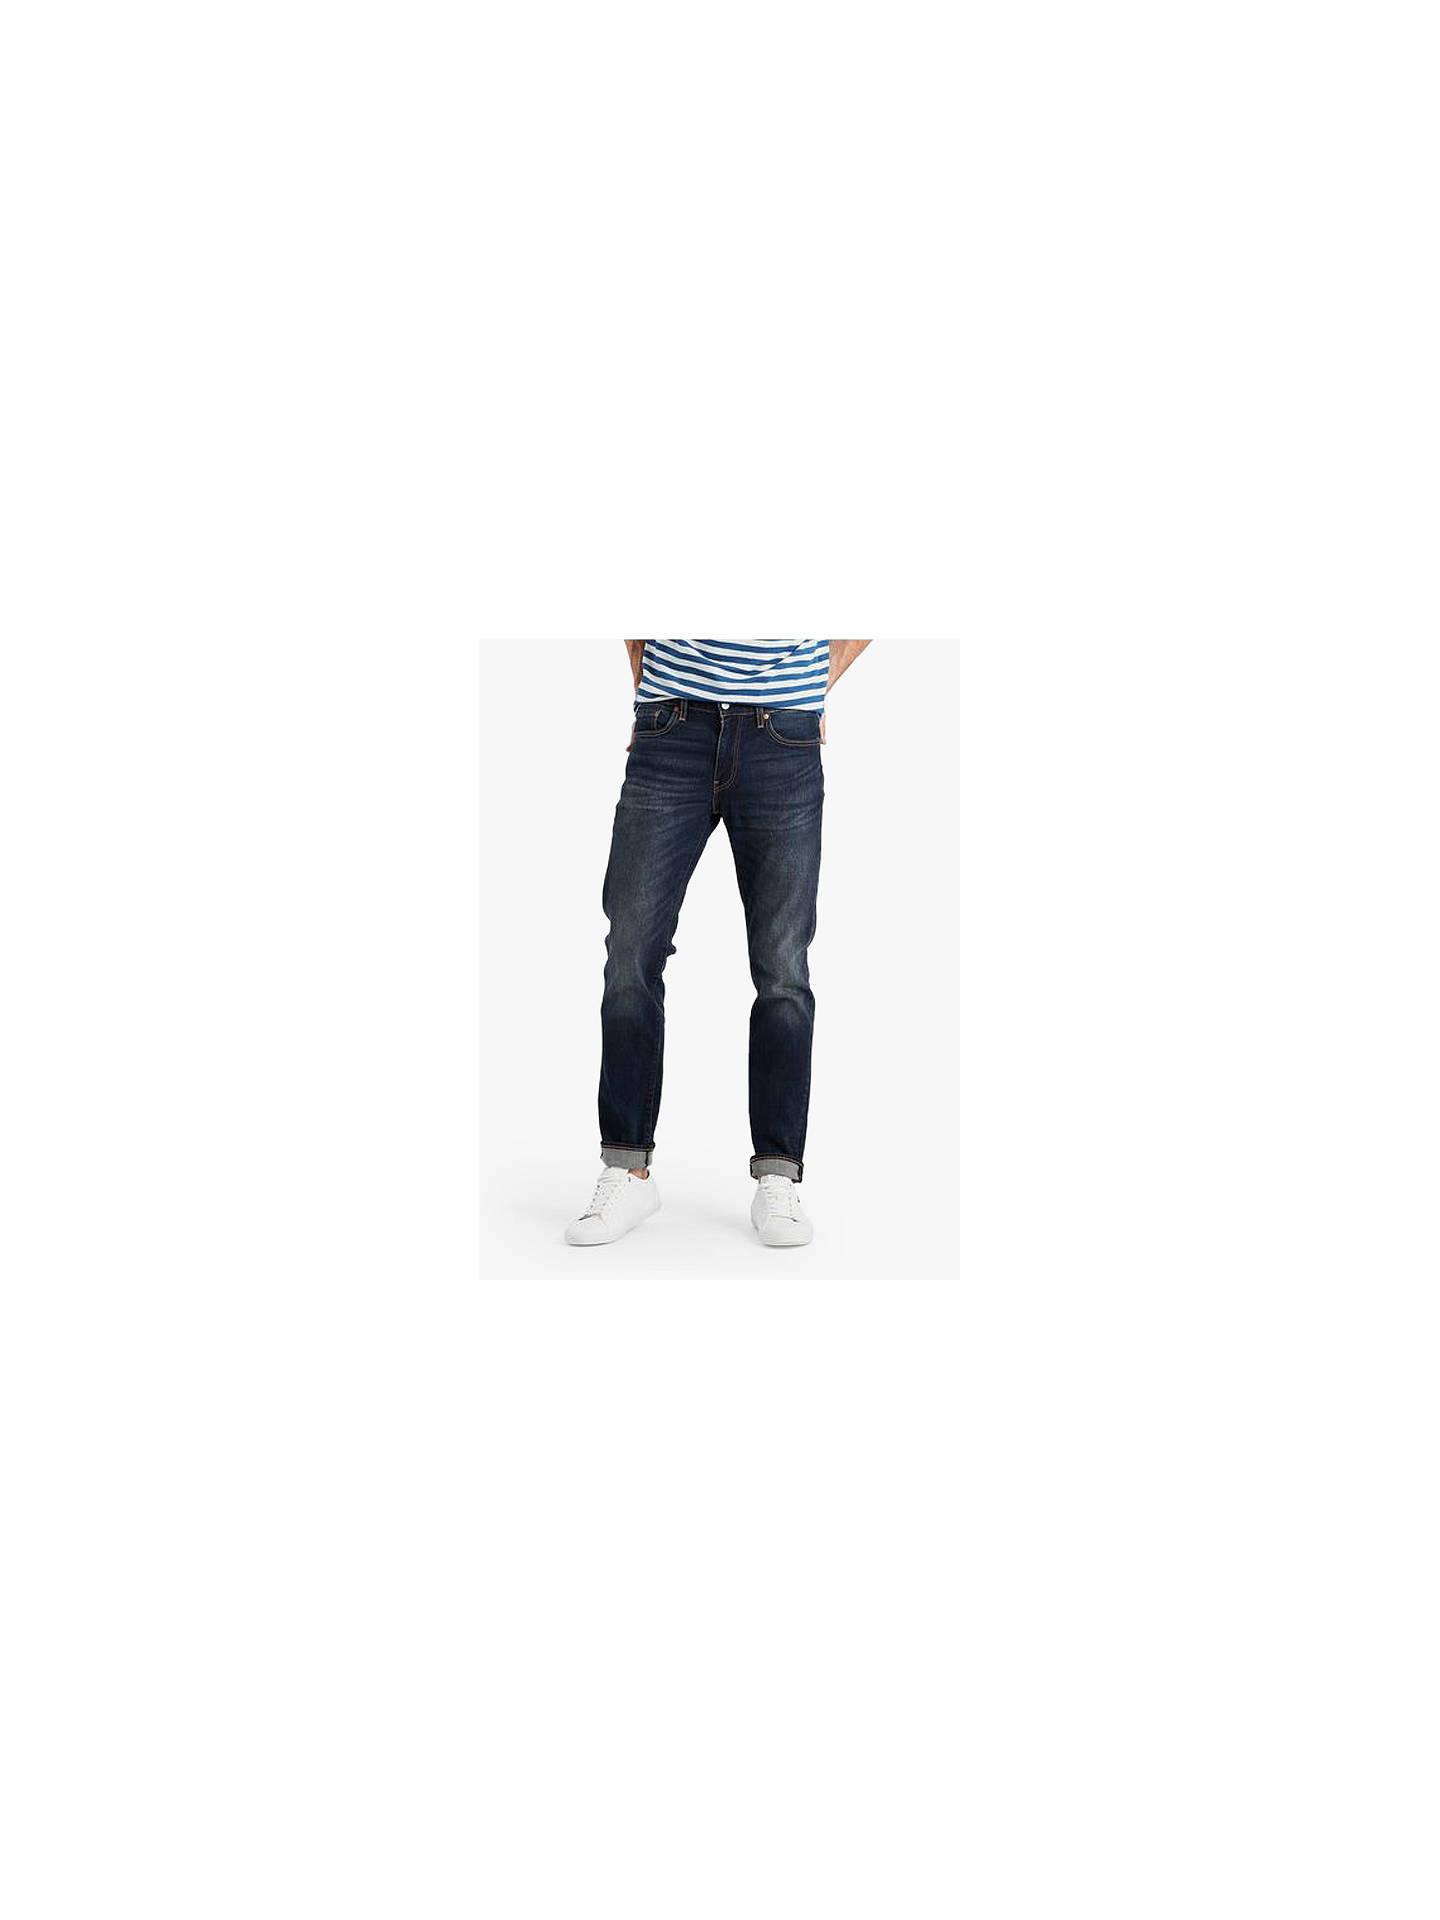 ea9094e585 Buy Levi s 511 Slim Jeans